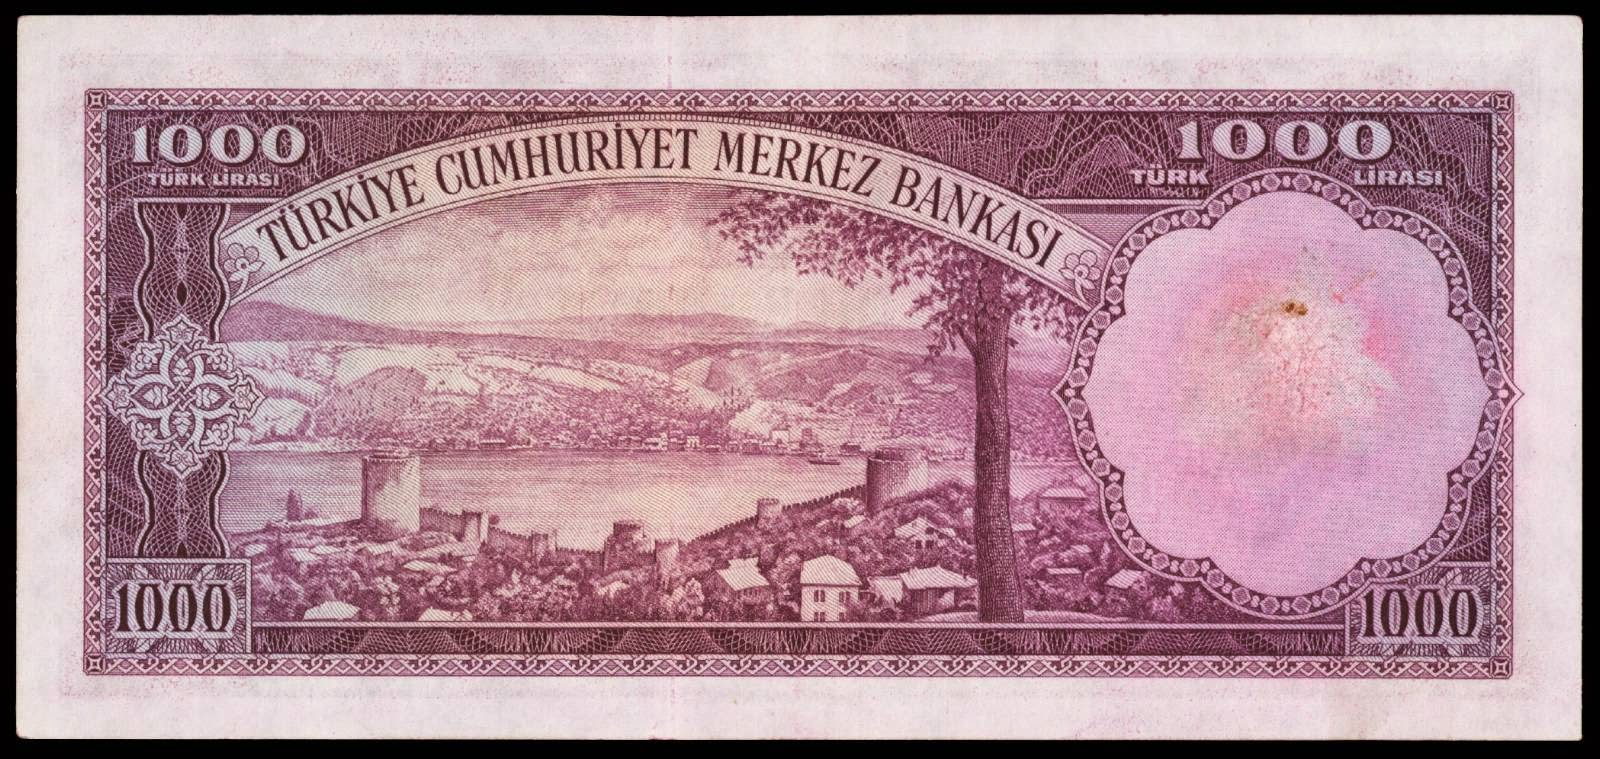 Turkey currency 1000 Turkish Lira banknote 1953